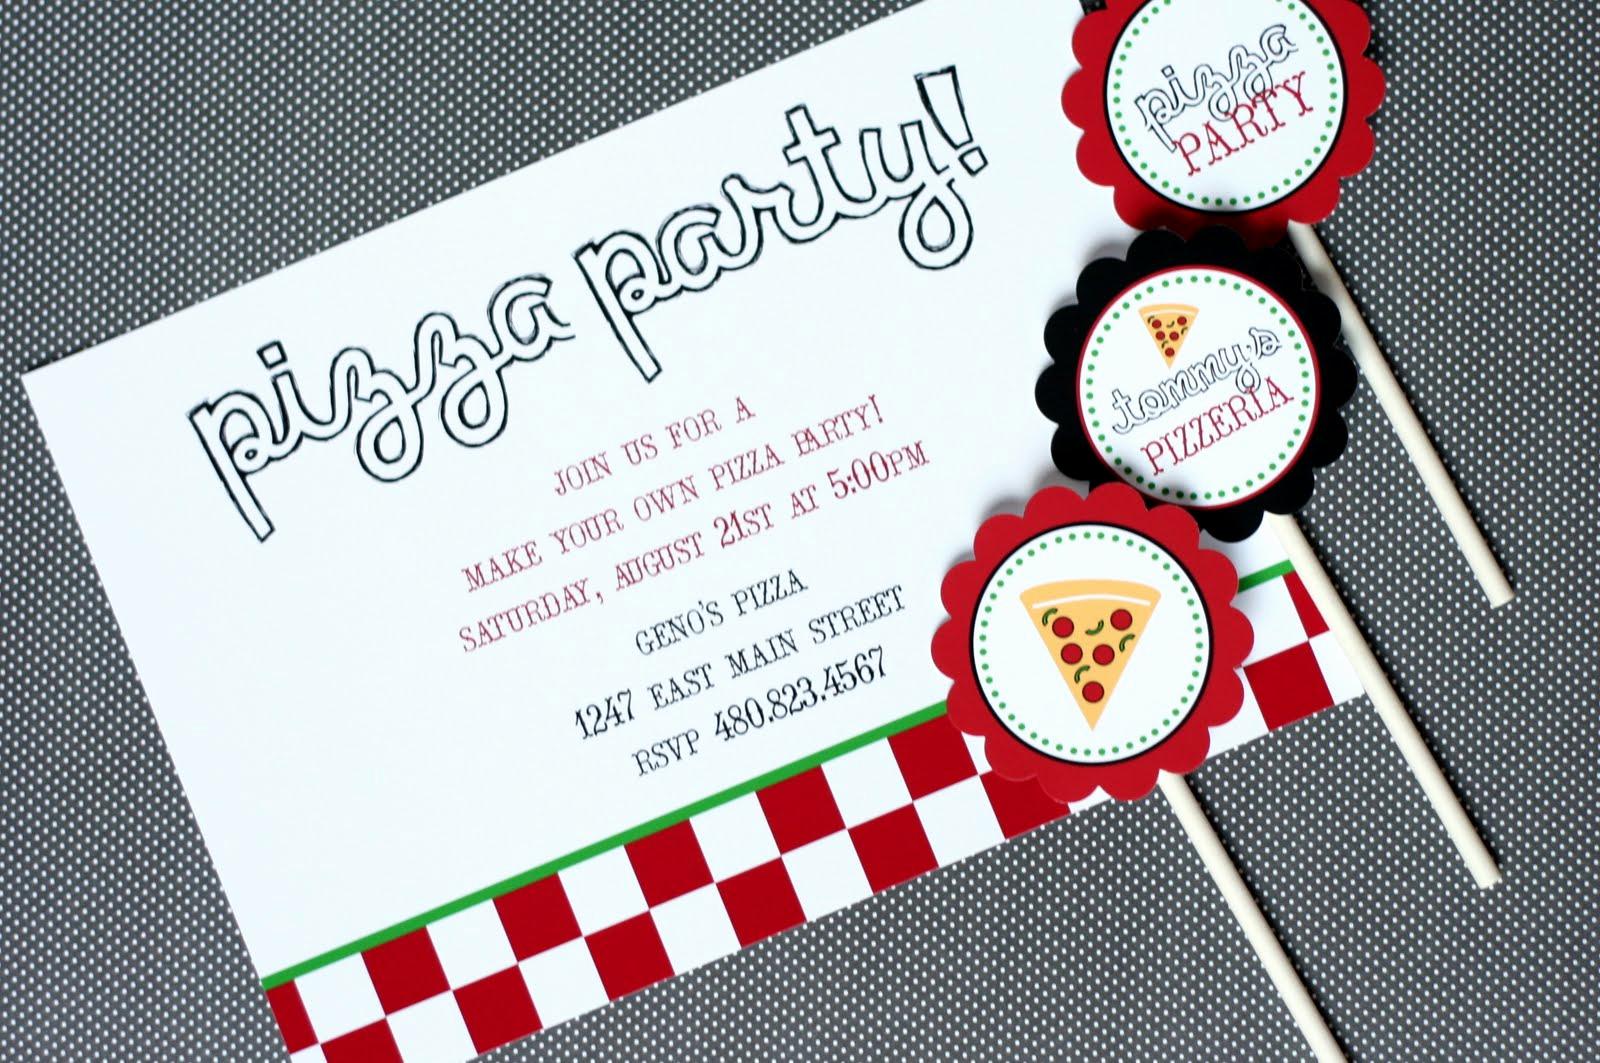 Pizza Party Birthday Invitation Unique the tomkat Studio Press New Pizza Party Designs On Cbs5